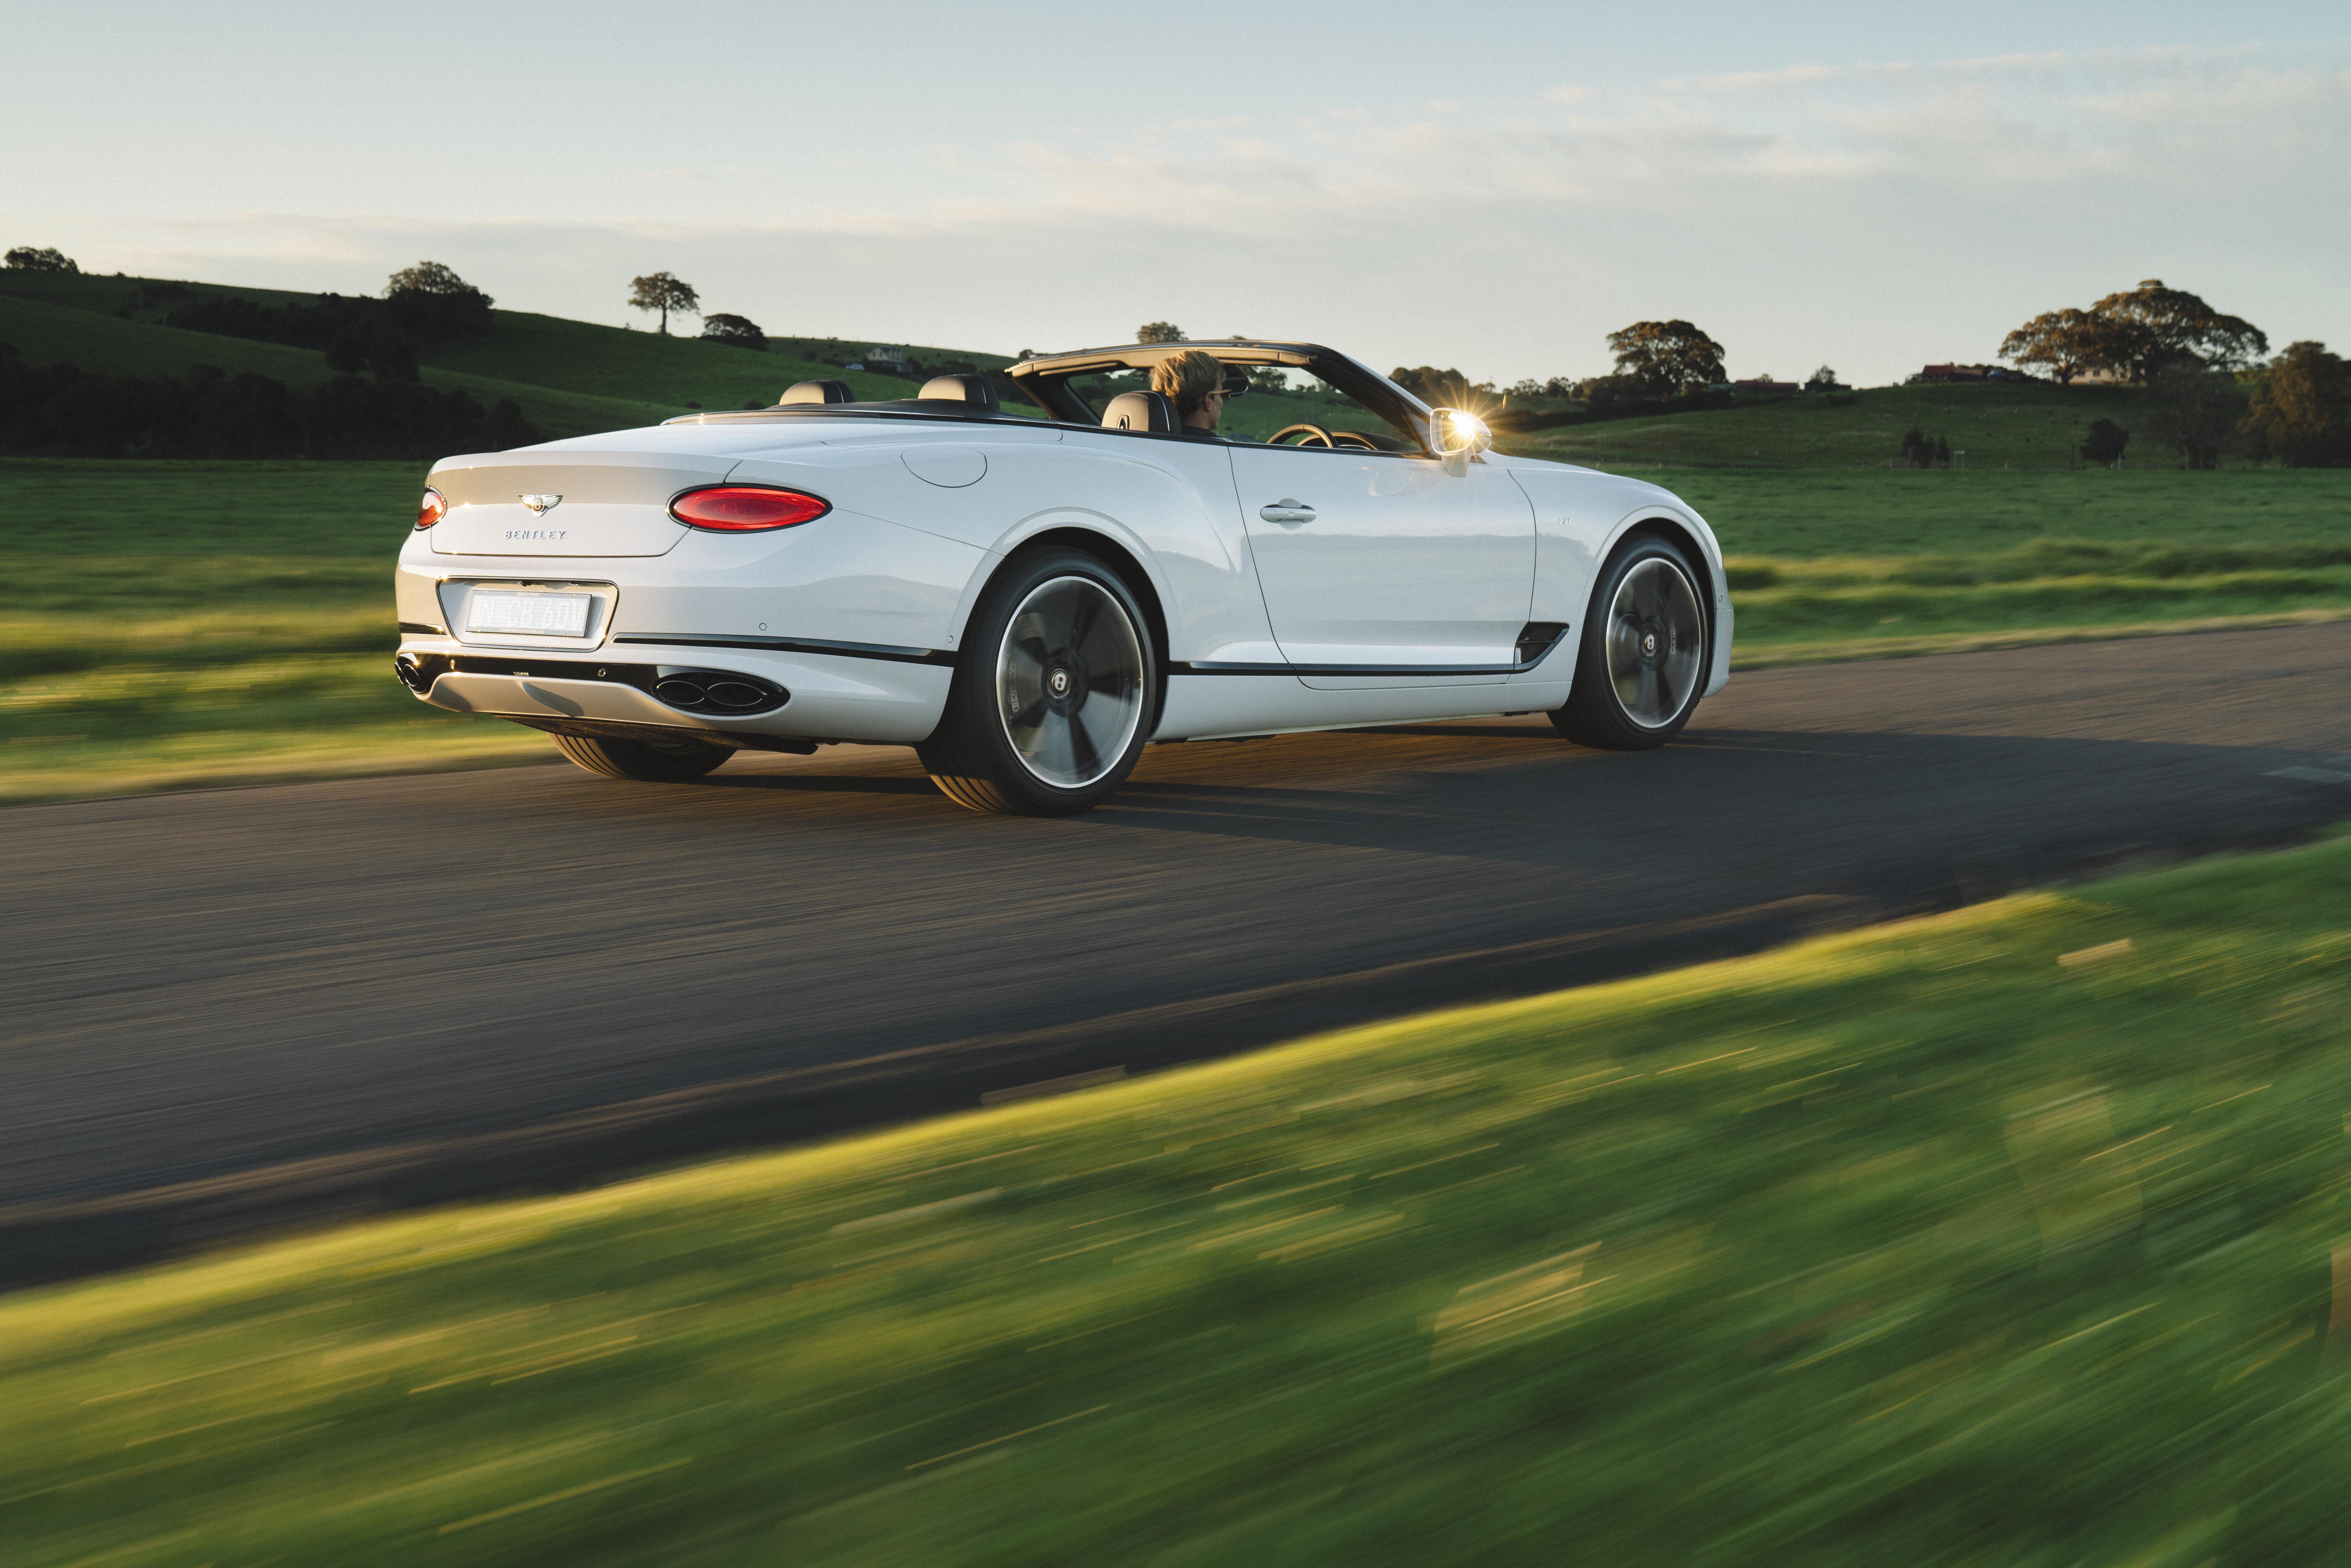 Motor Reviews Bentley Continental GTC V 8 Rear Action